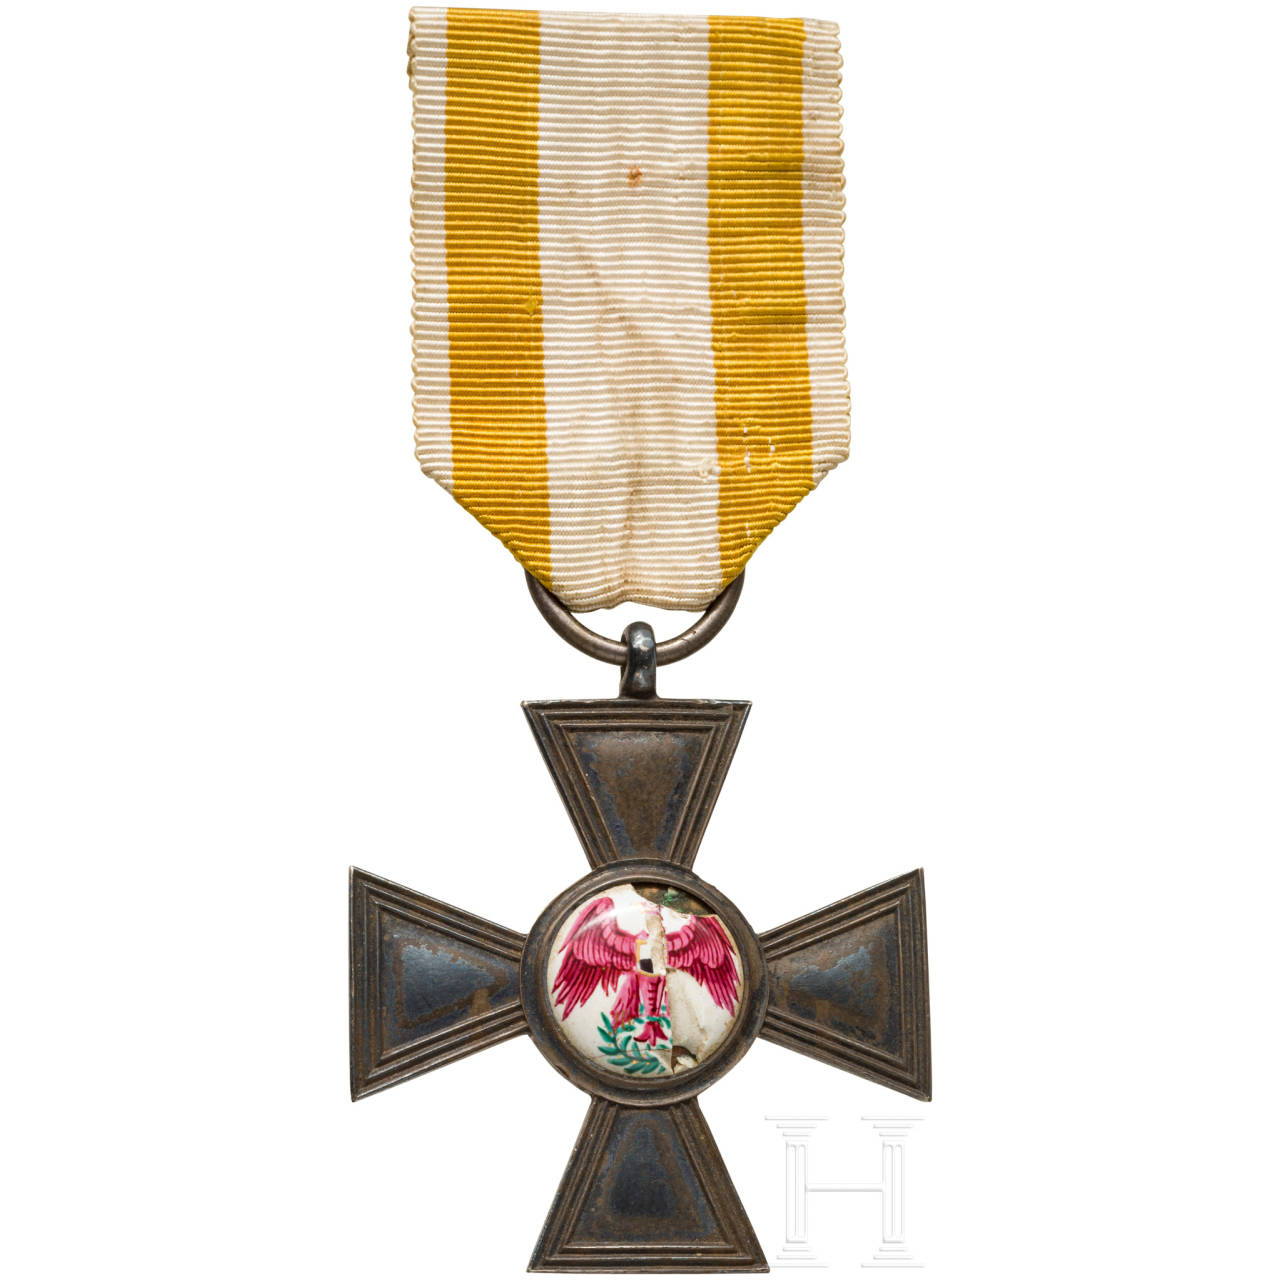 Roter Adler-Orden, Preußen